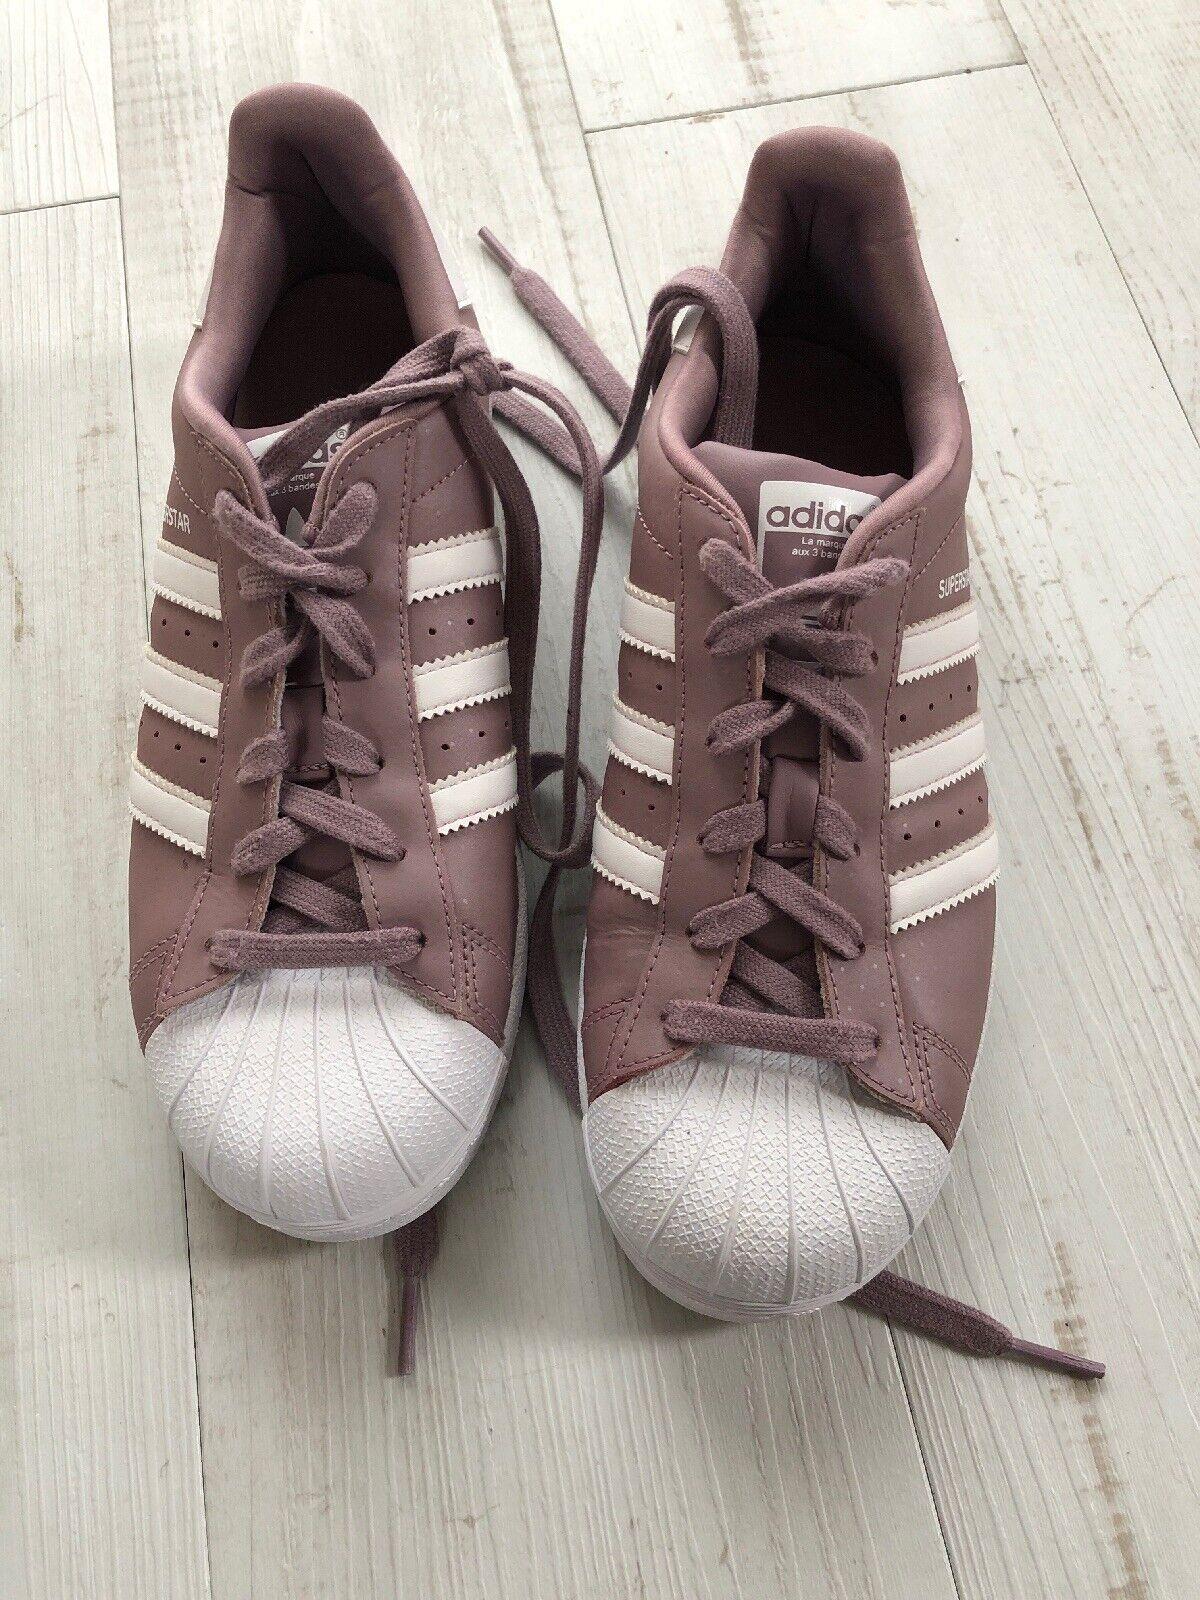 Adidas 5,5 Gr. lila 3 2 38 Gr. superstar adac5uymz34673